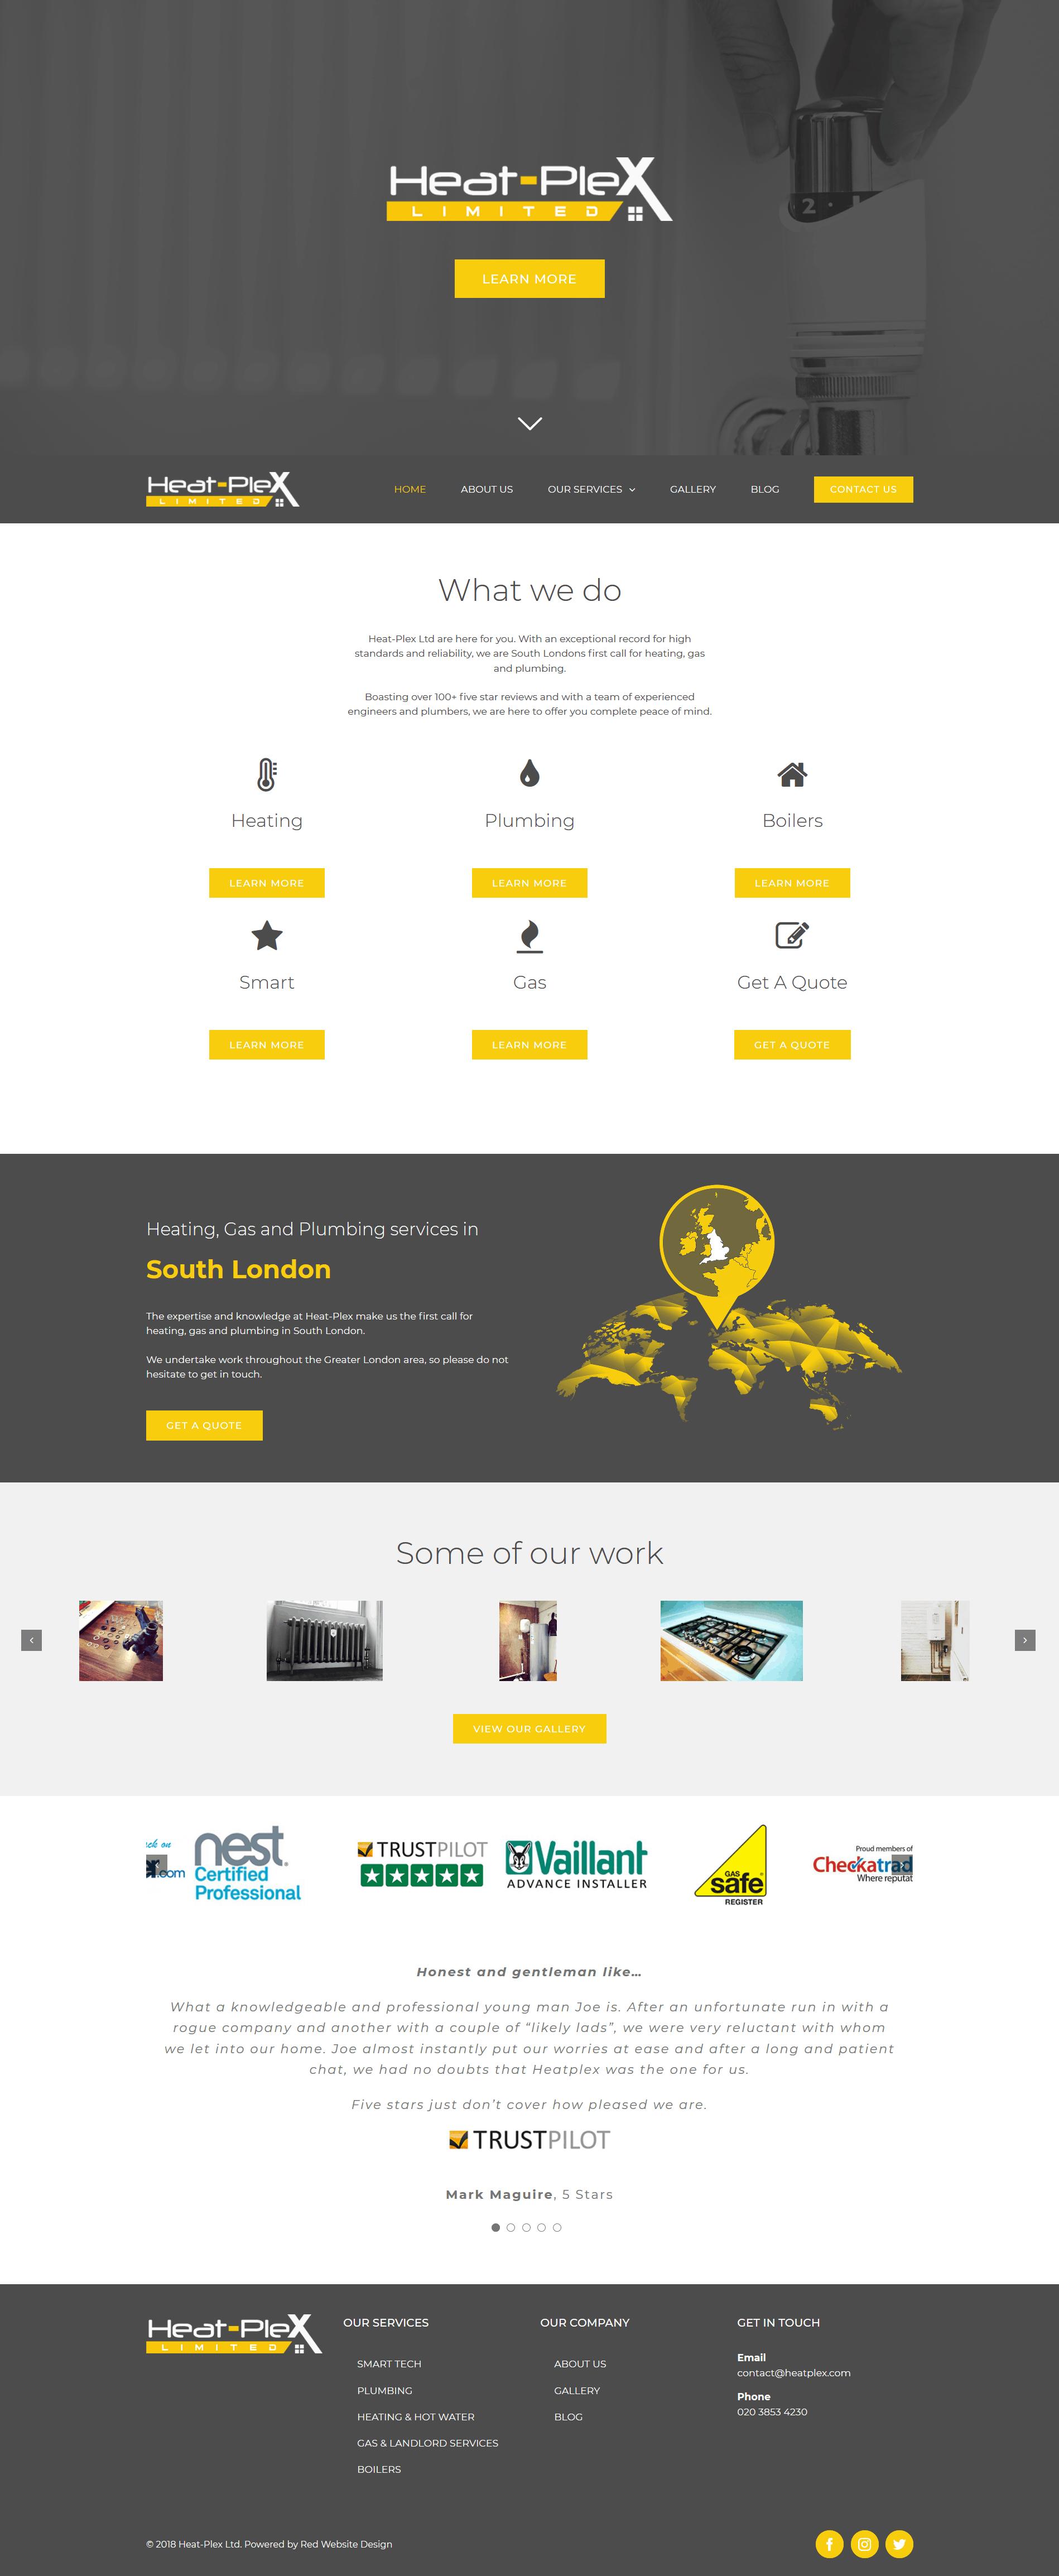 Web Design Leatherhead